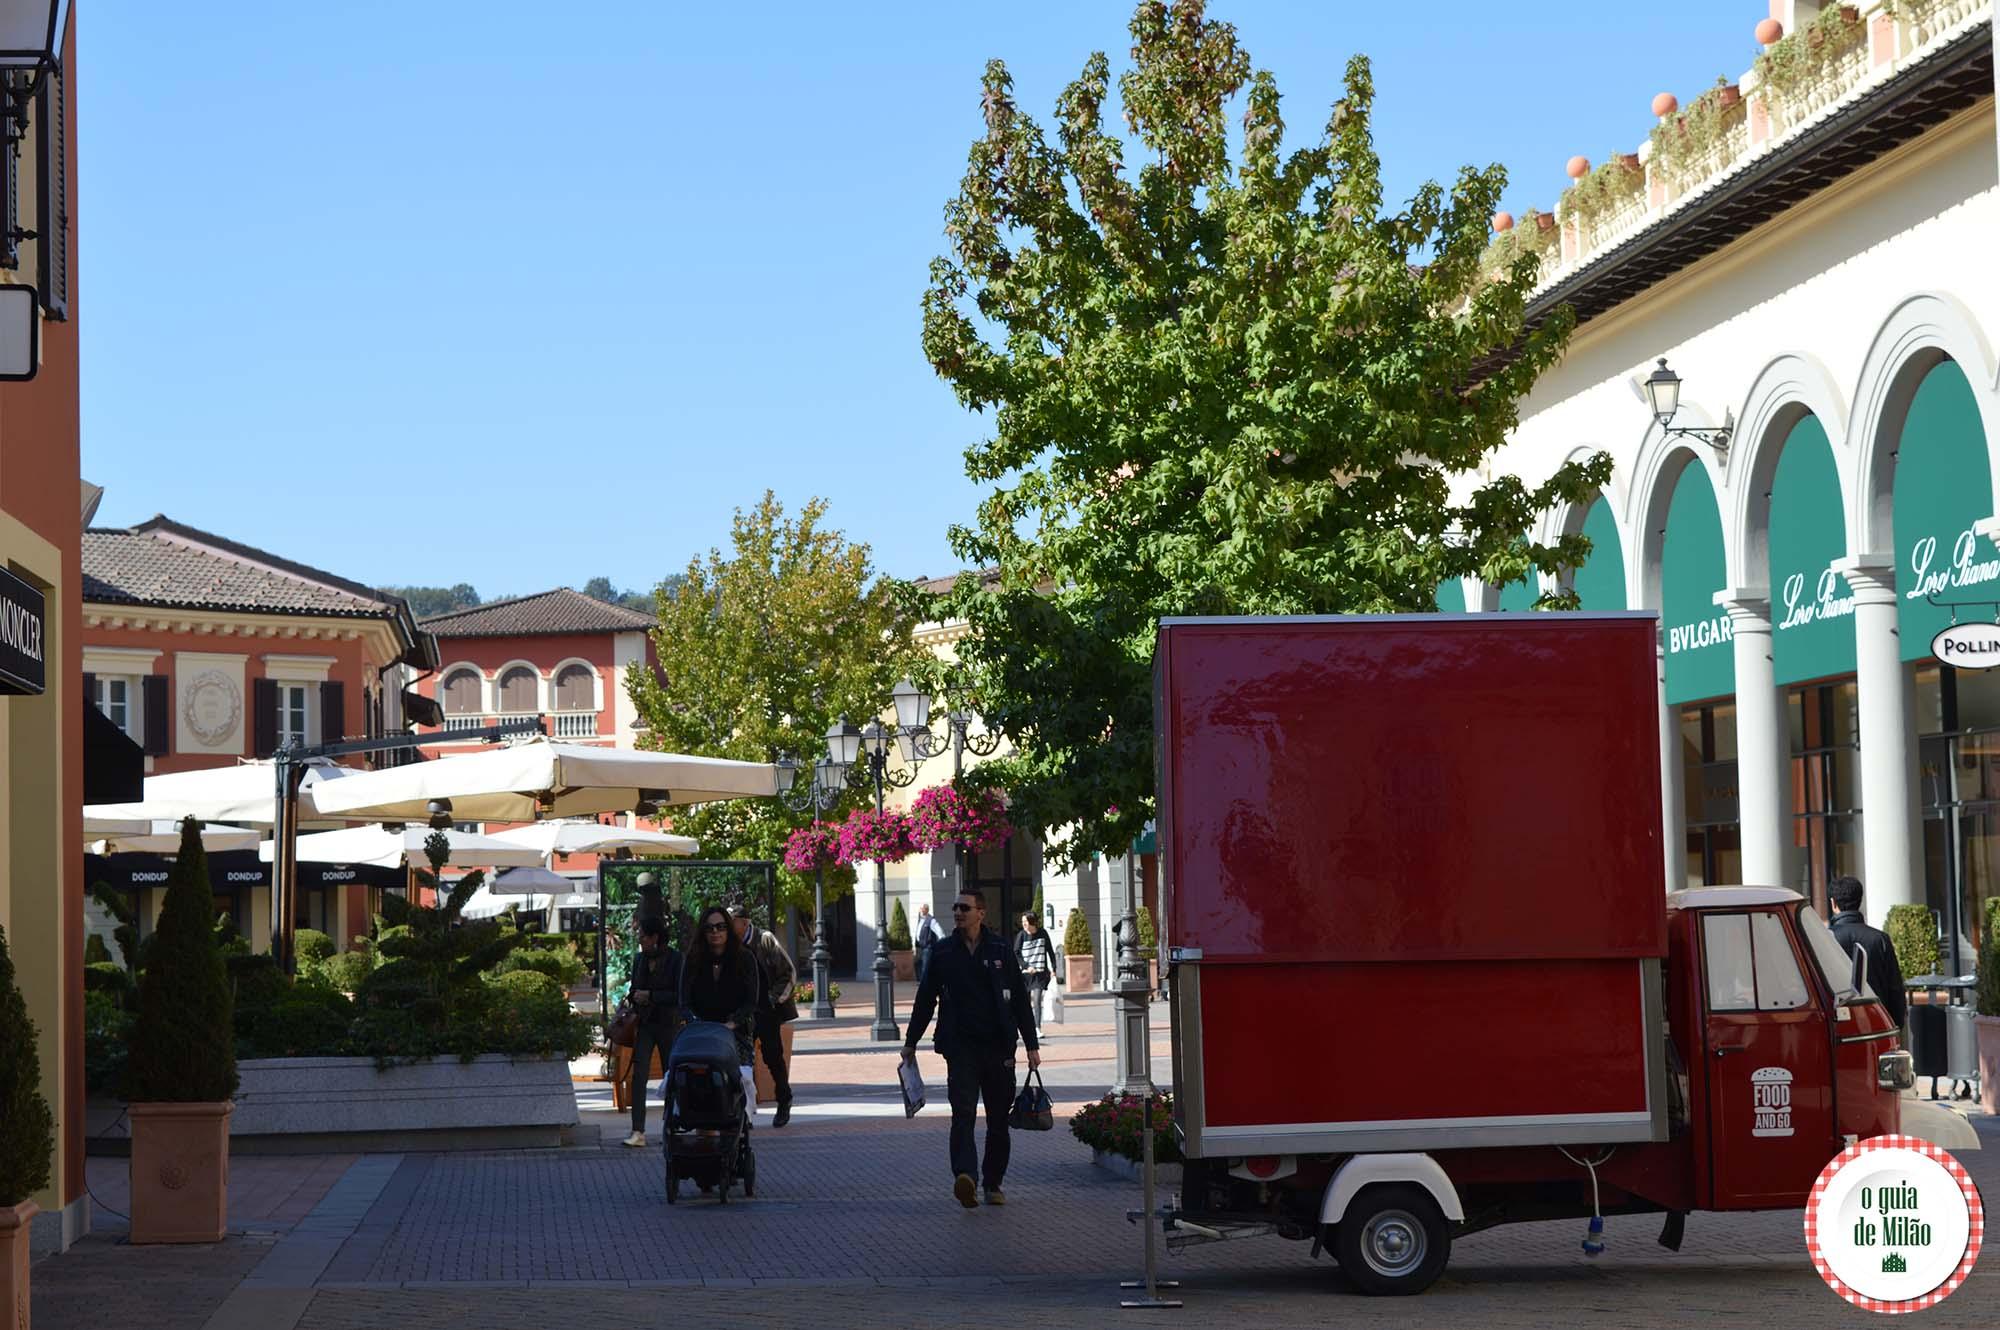 Serravalle Designer Outlet Scrivia Itália: vale a pena?